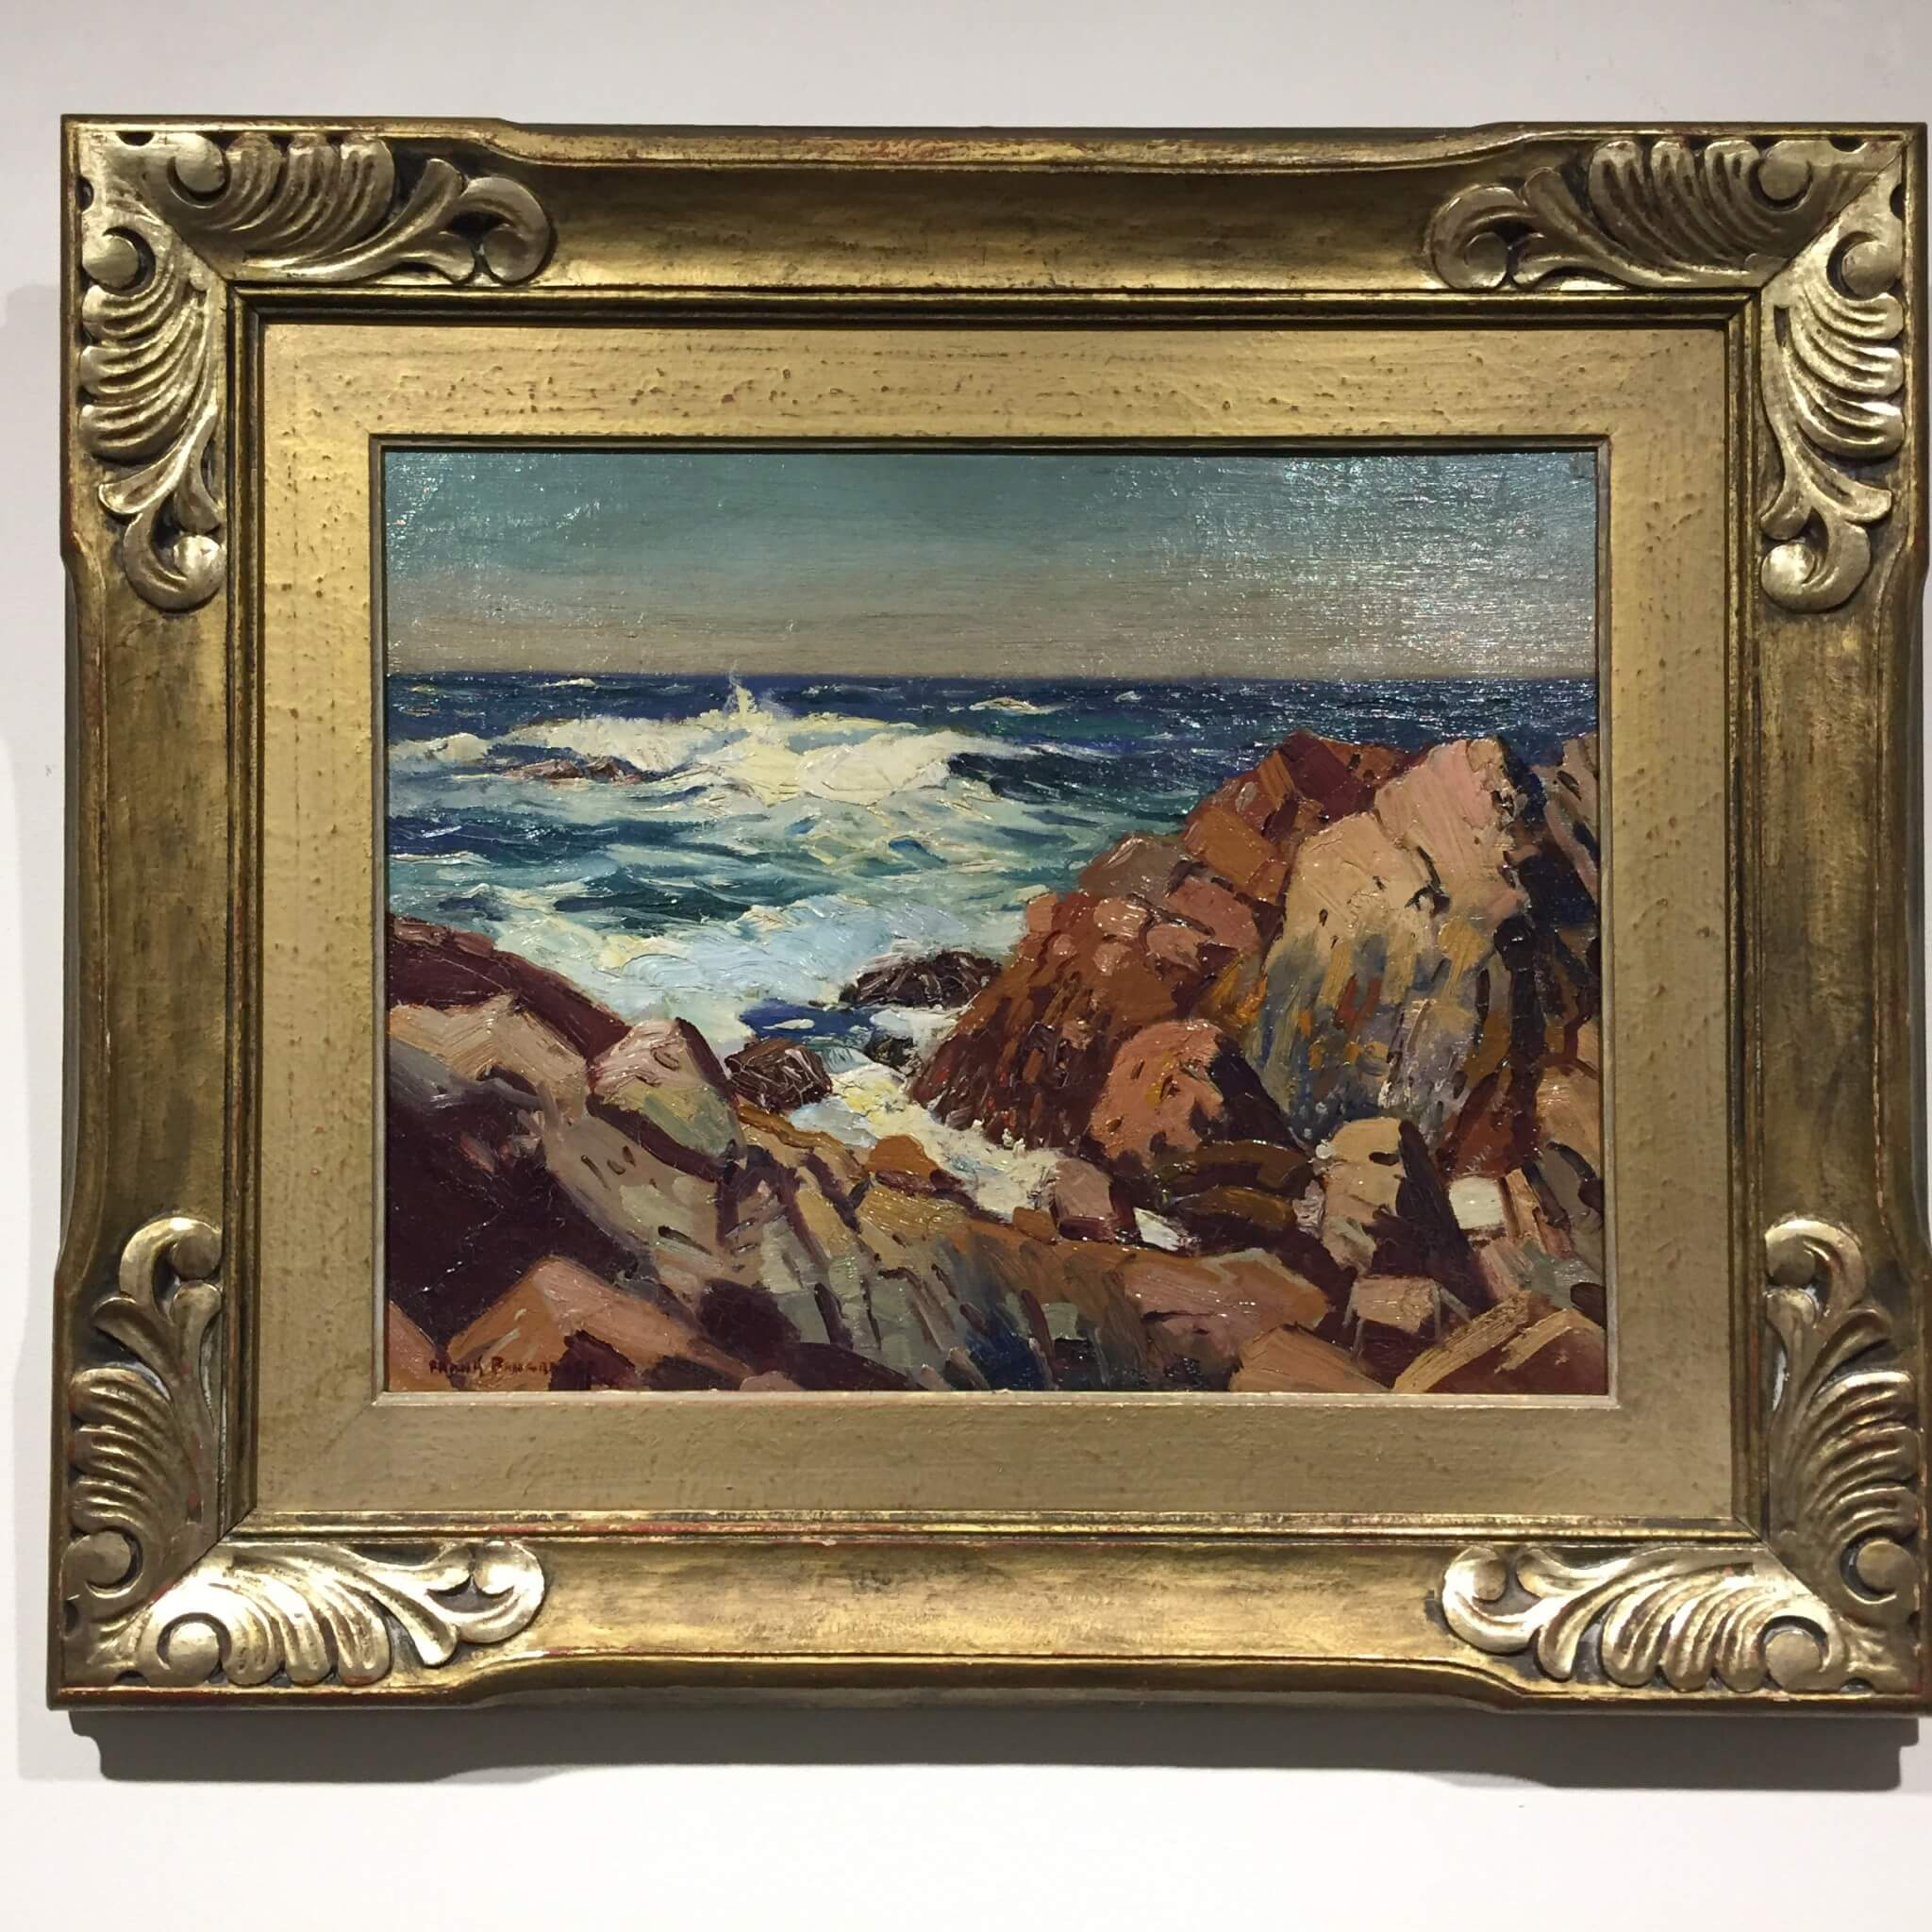 Frank Panabaker East Coast Shoreline 11x14 Framed